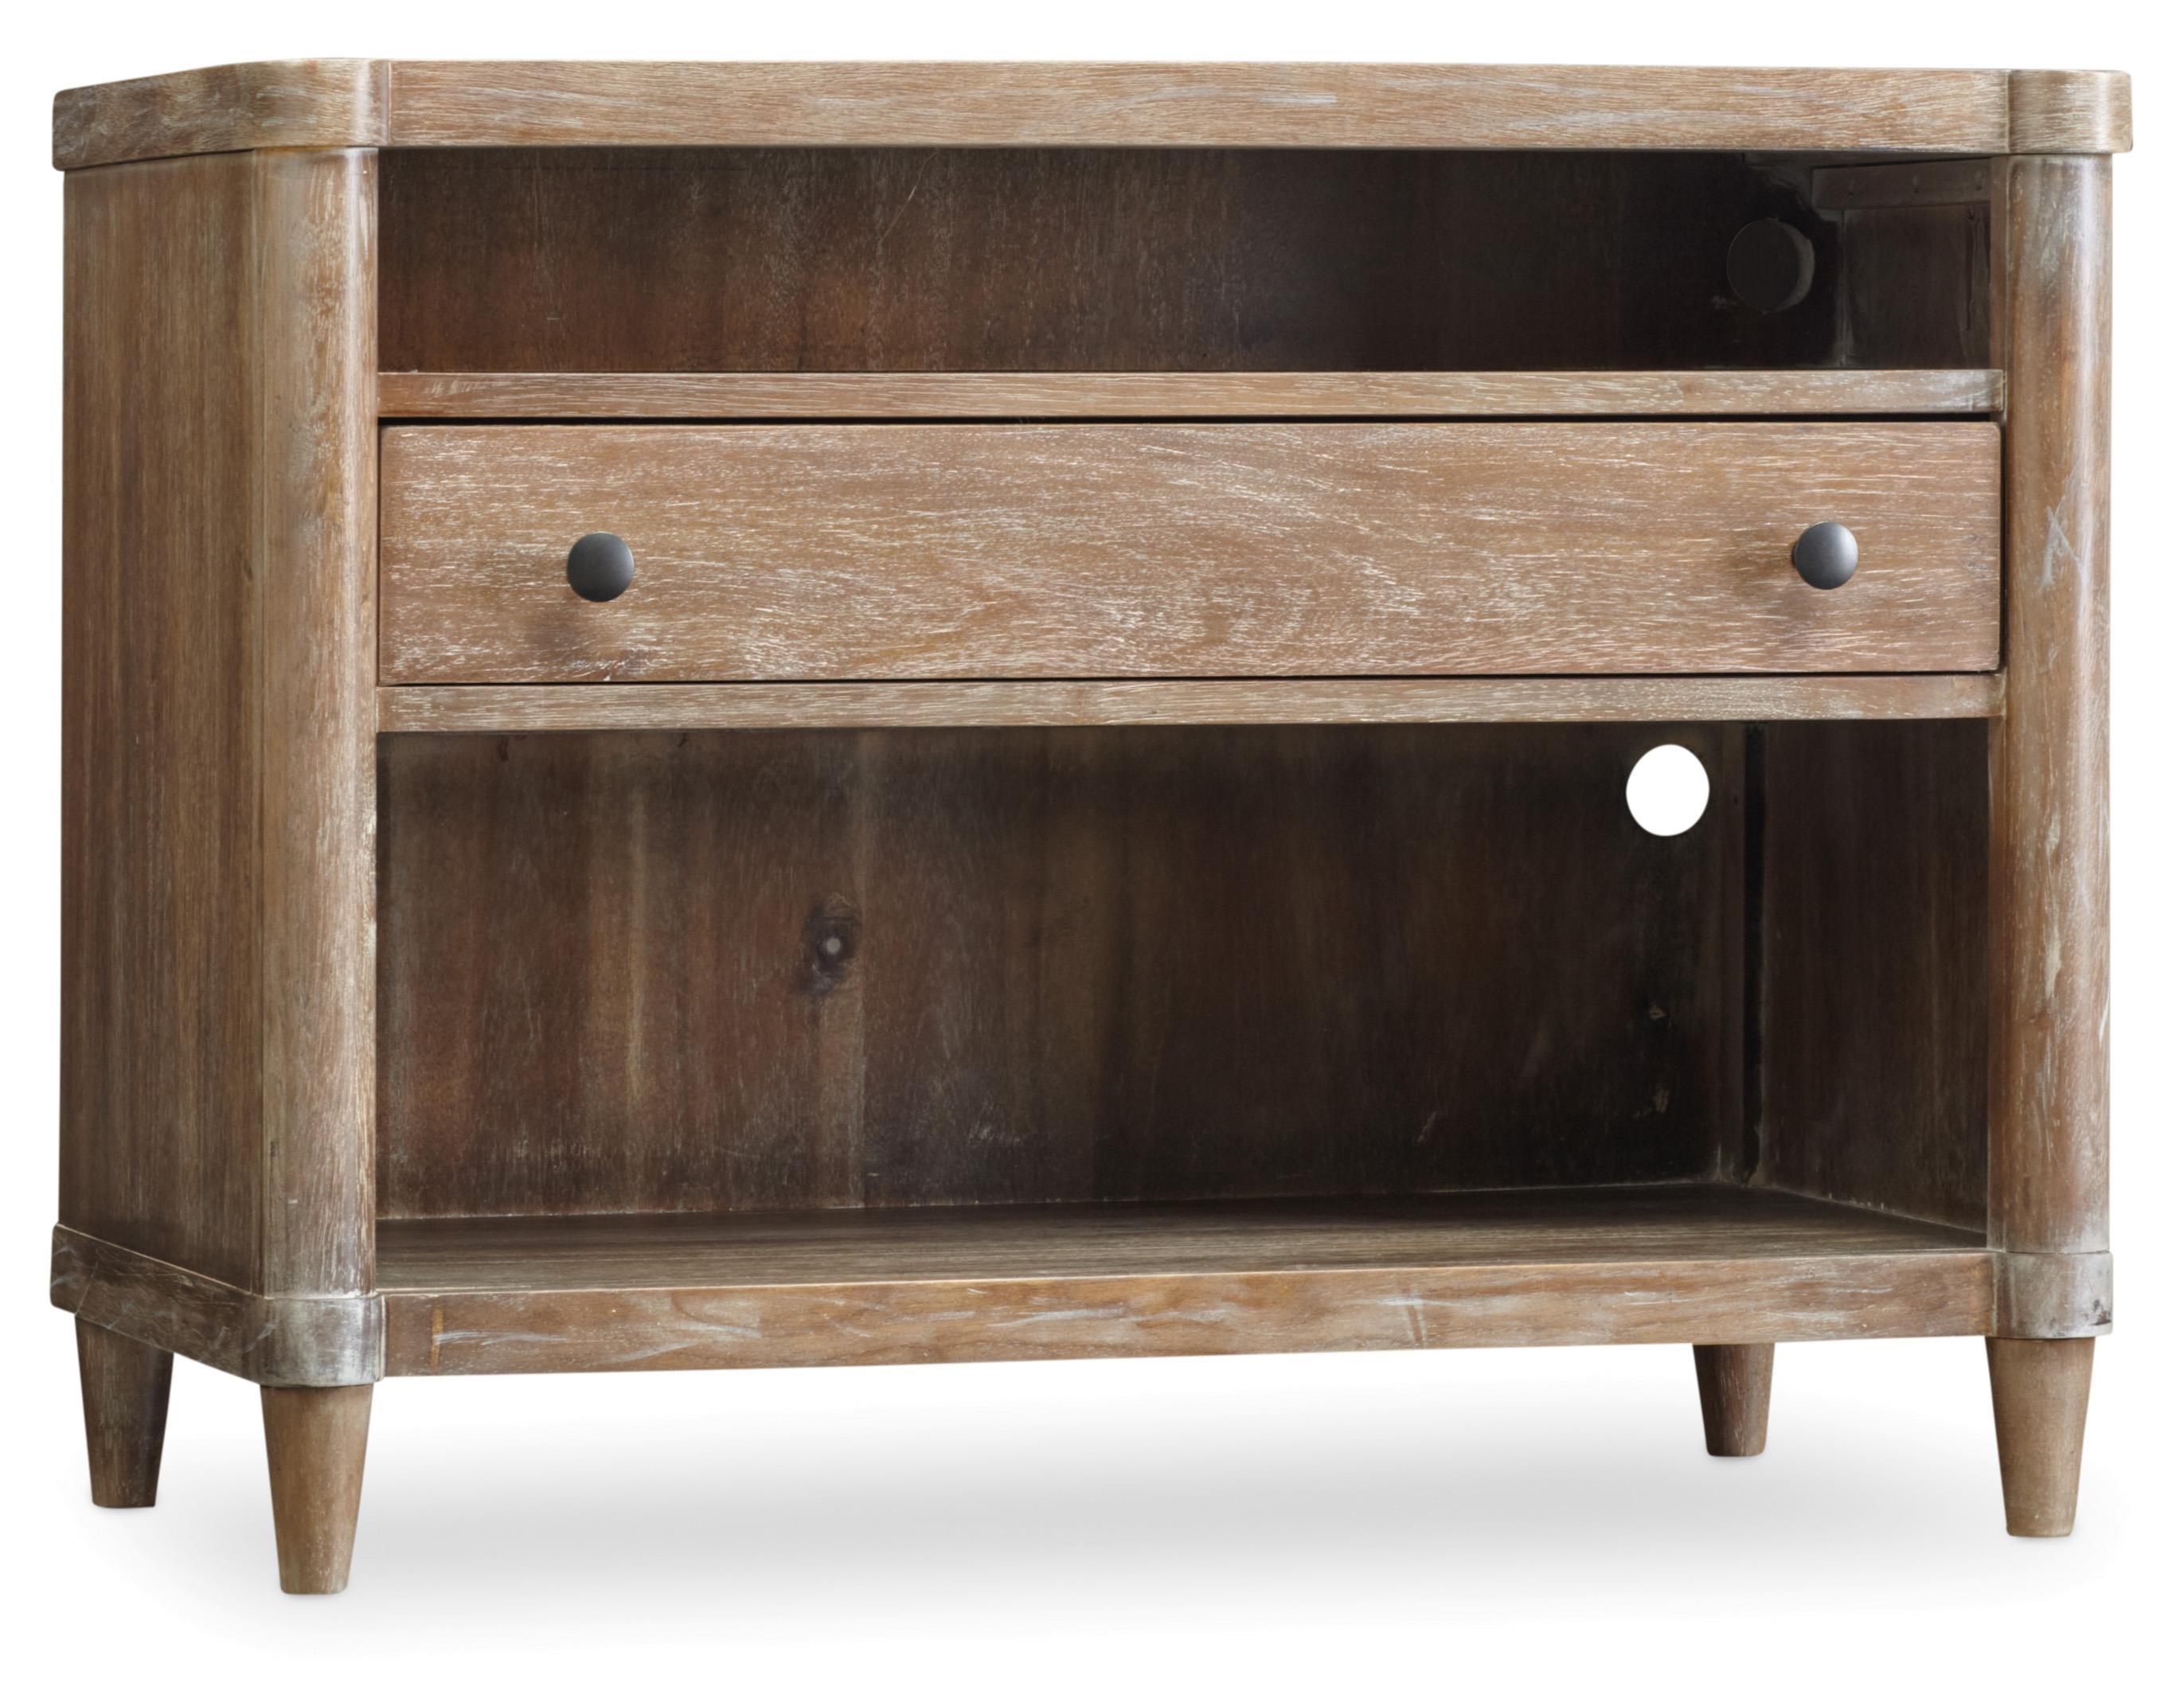 Hooker Furniture Studio 7H Elin Nightstand - Item Number: 5382-90016